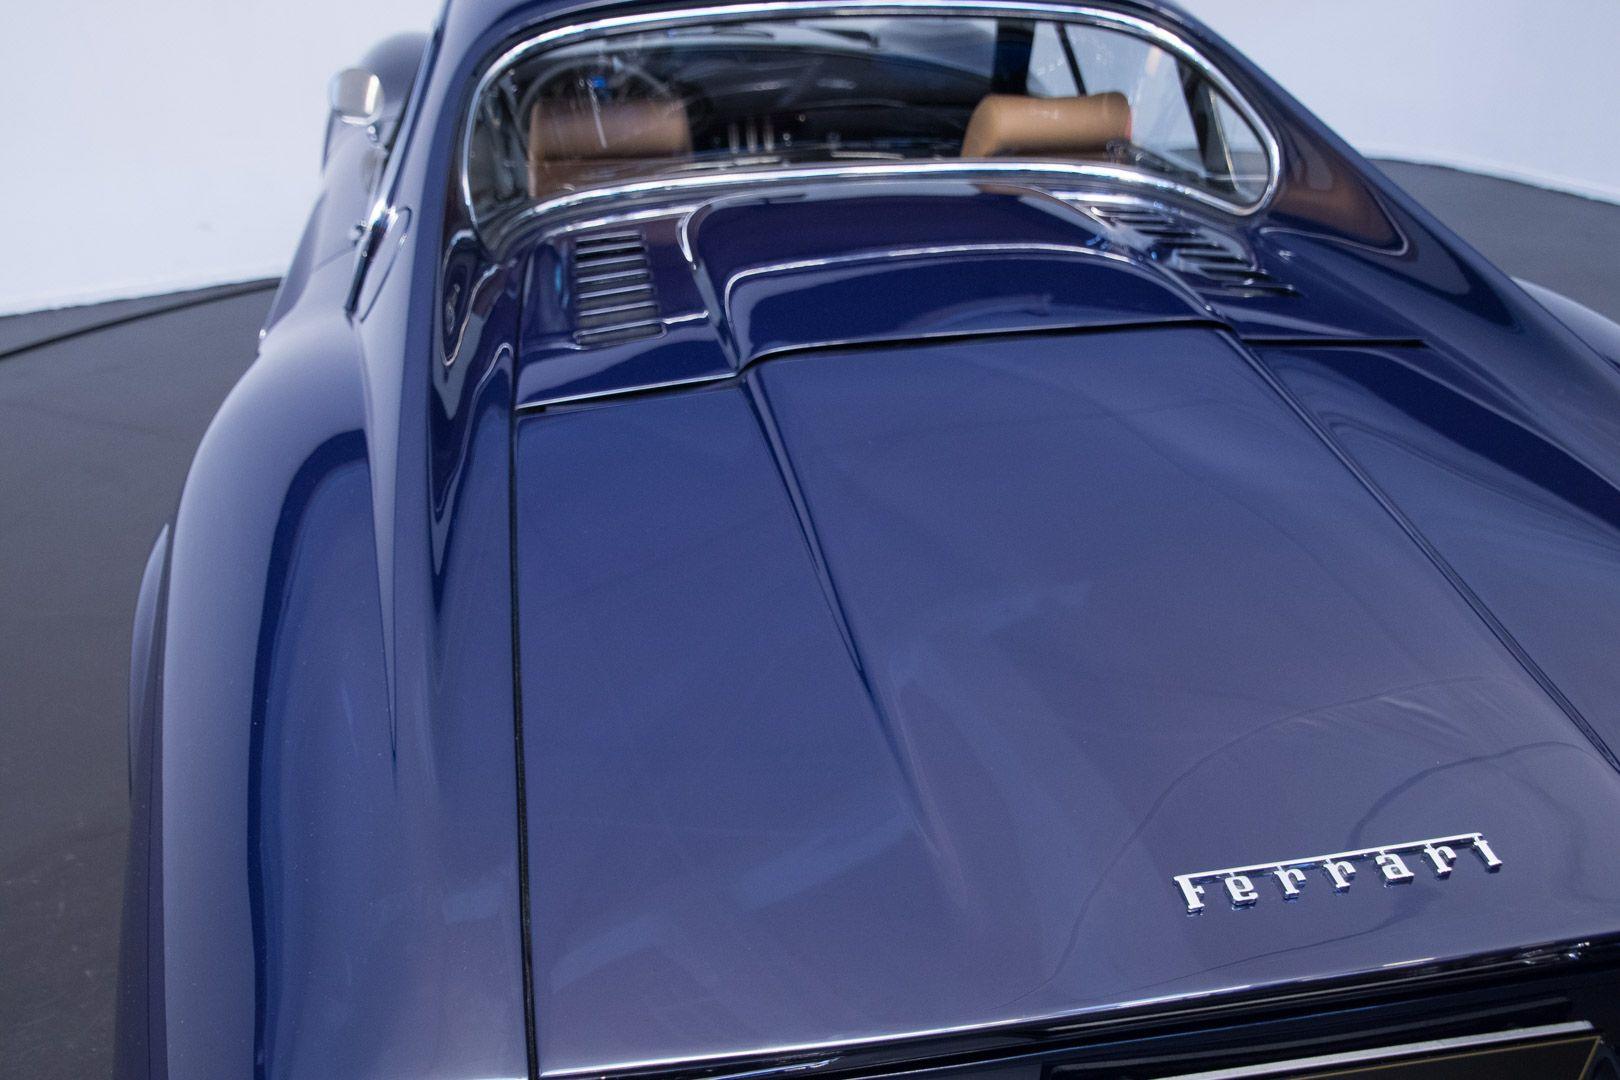 1972 Ferrari Dino 246 GT 17483